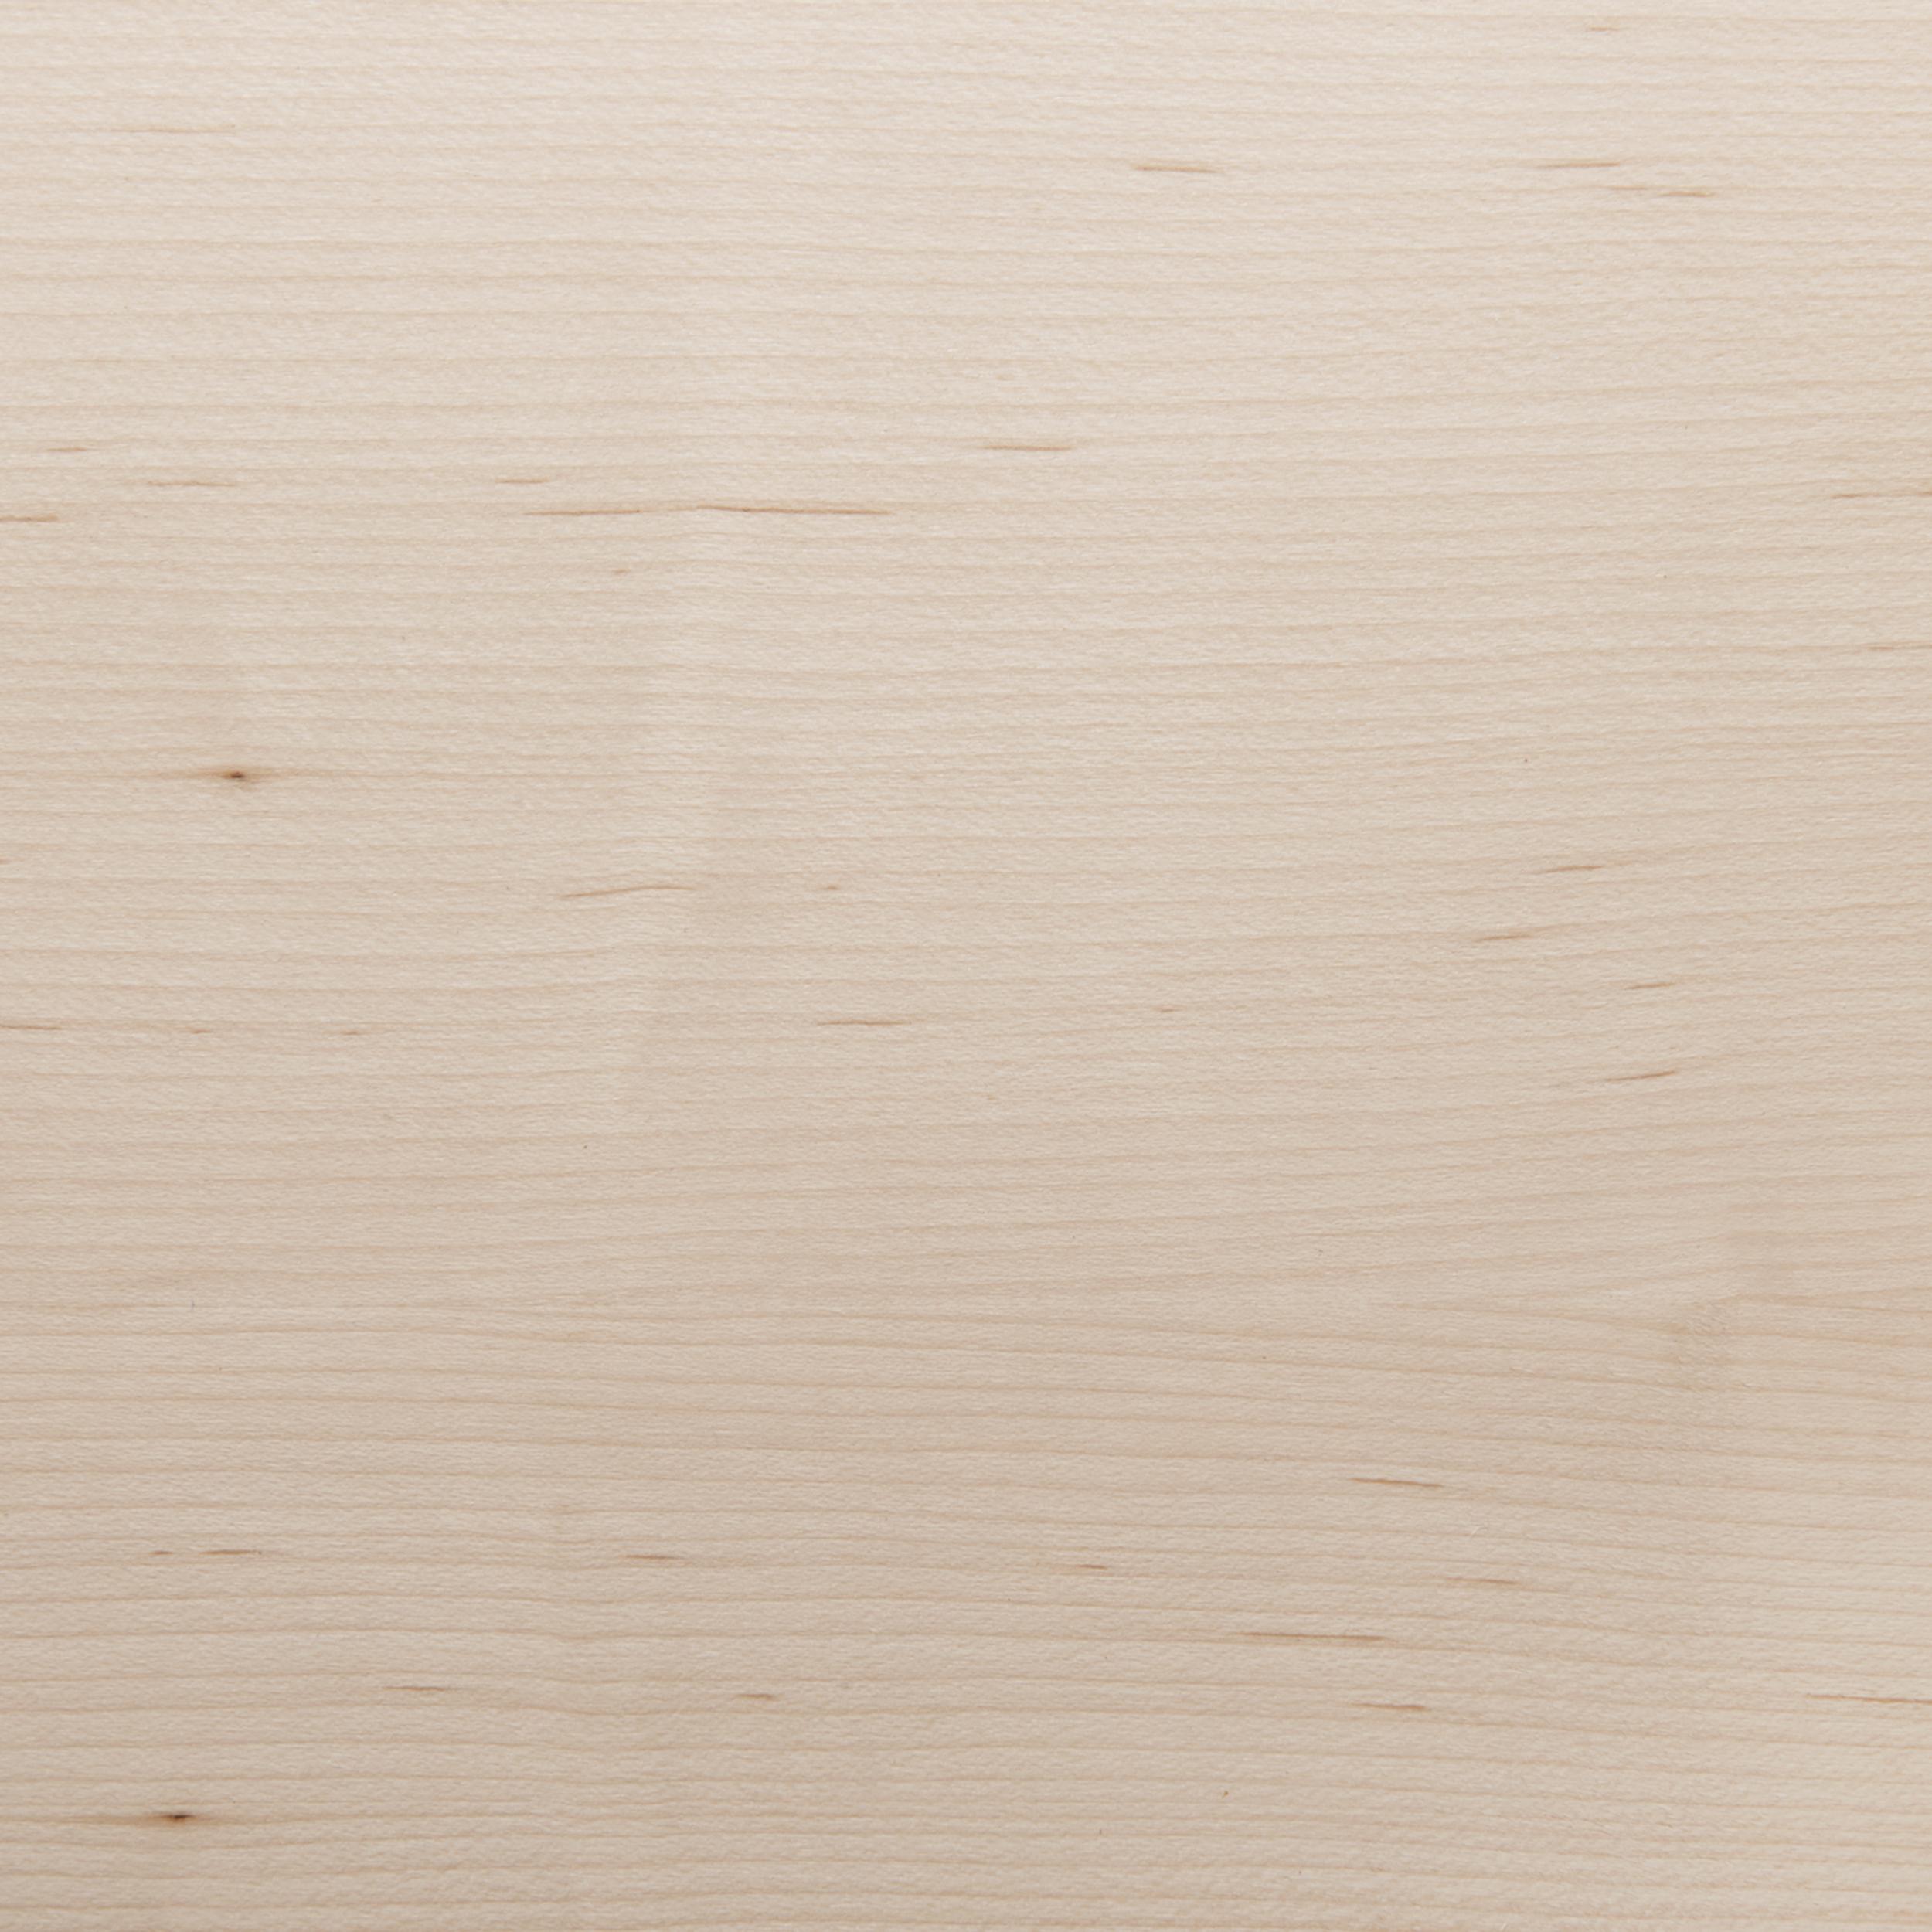 Maple Veneer Sheet Quarter Cut 4' x 8' 2-Ply Wood on Wood